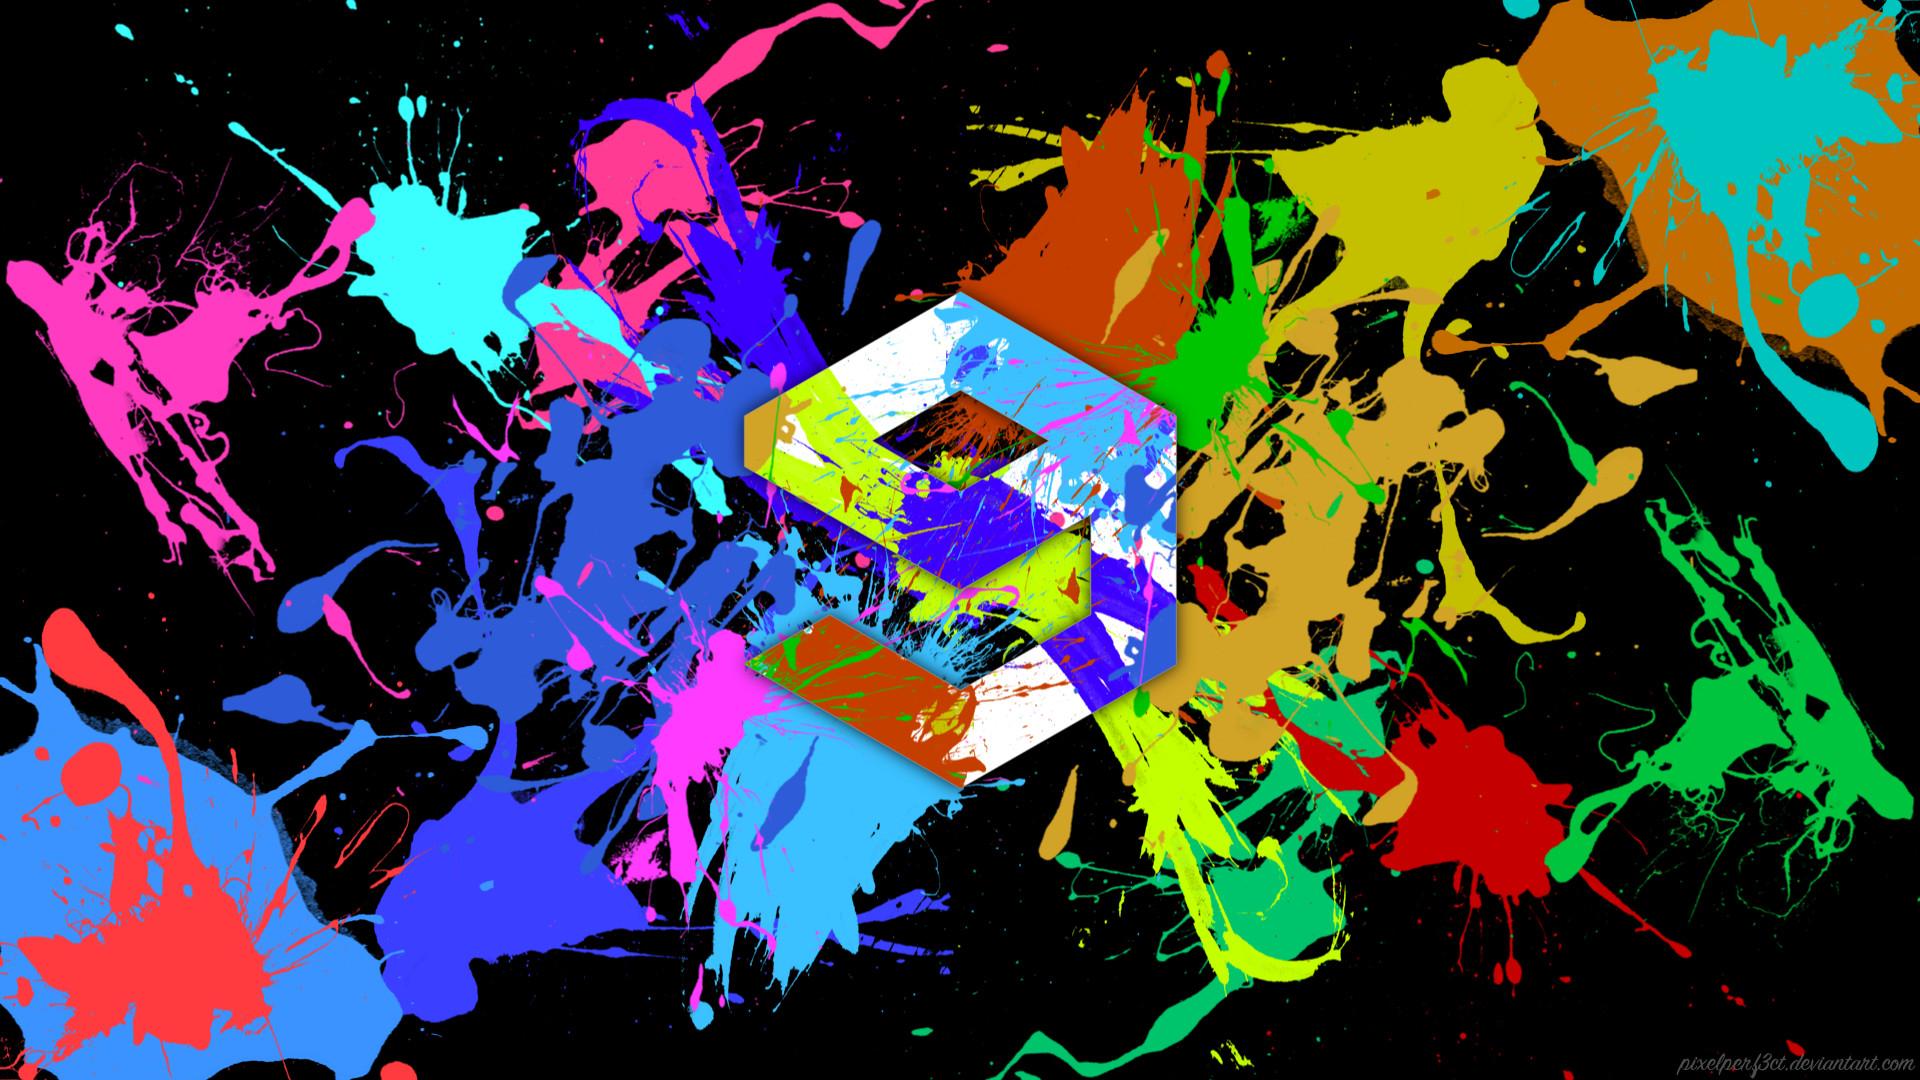 Res: 1920x1080, 9gag Color Splash 2 by pixelperf3ct 9gag Color Splash 2 by pixelperf3ct